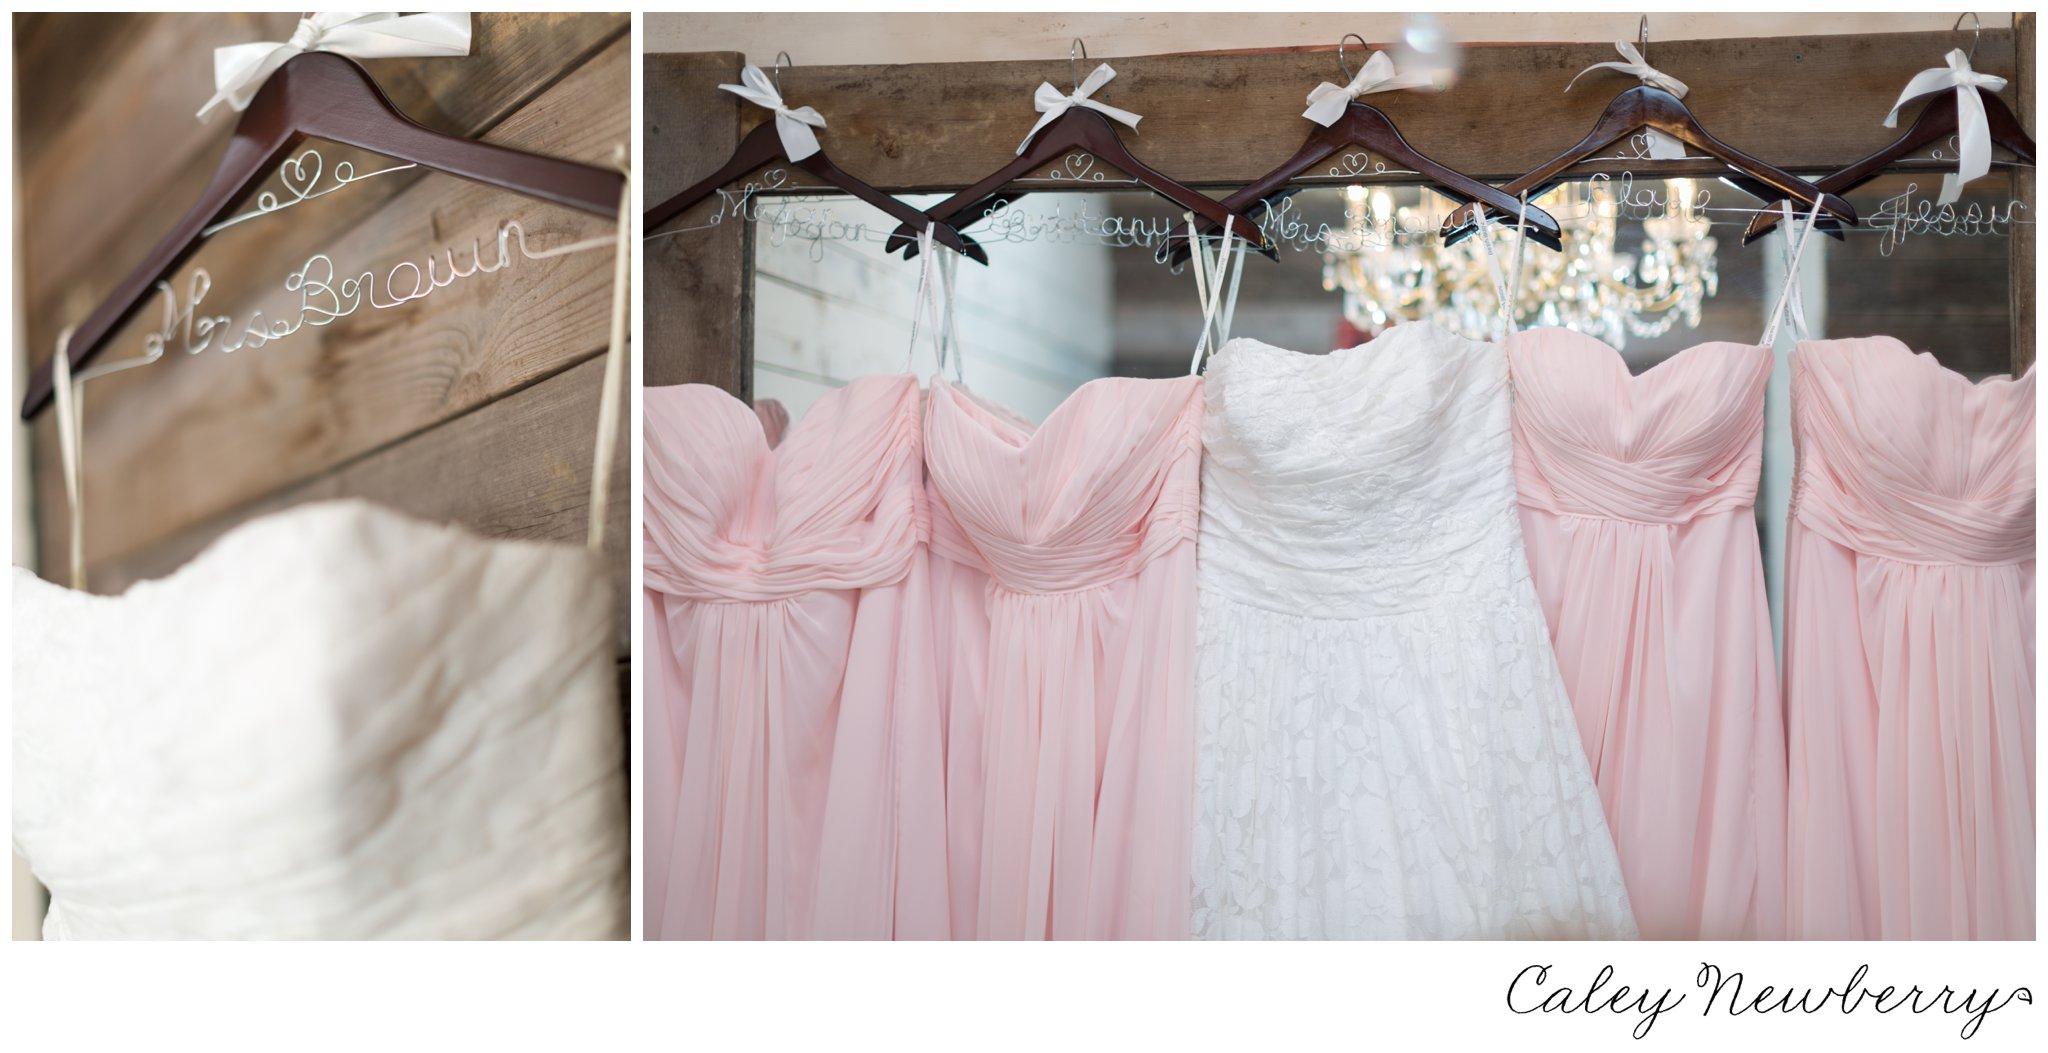 nashville-wedding-dress.jpg